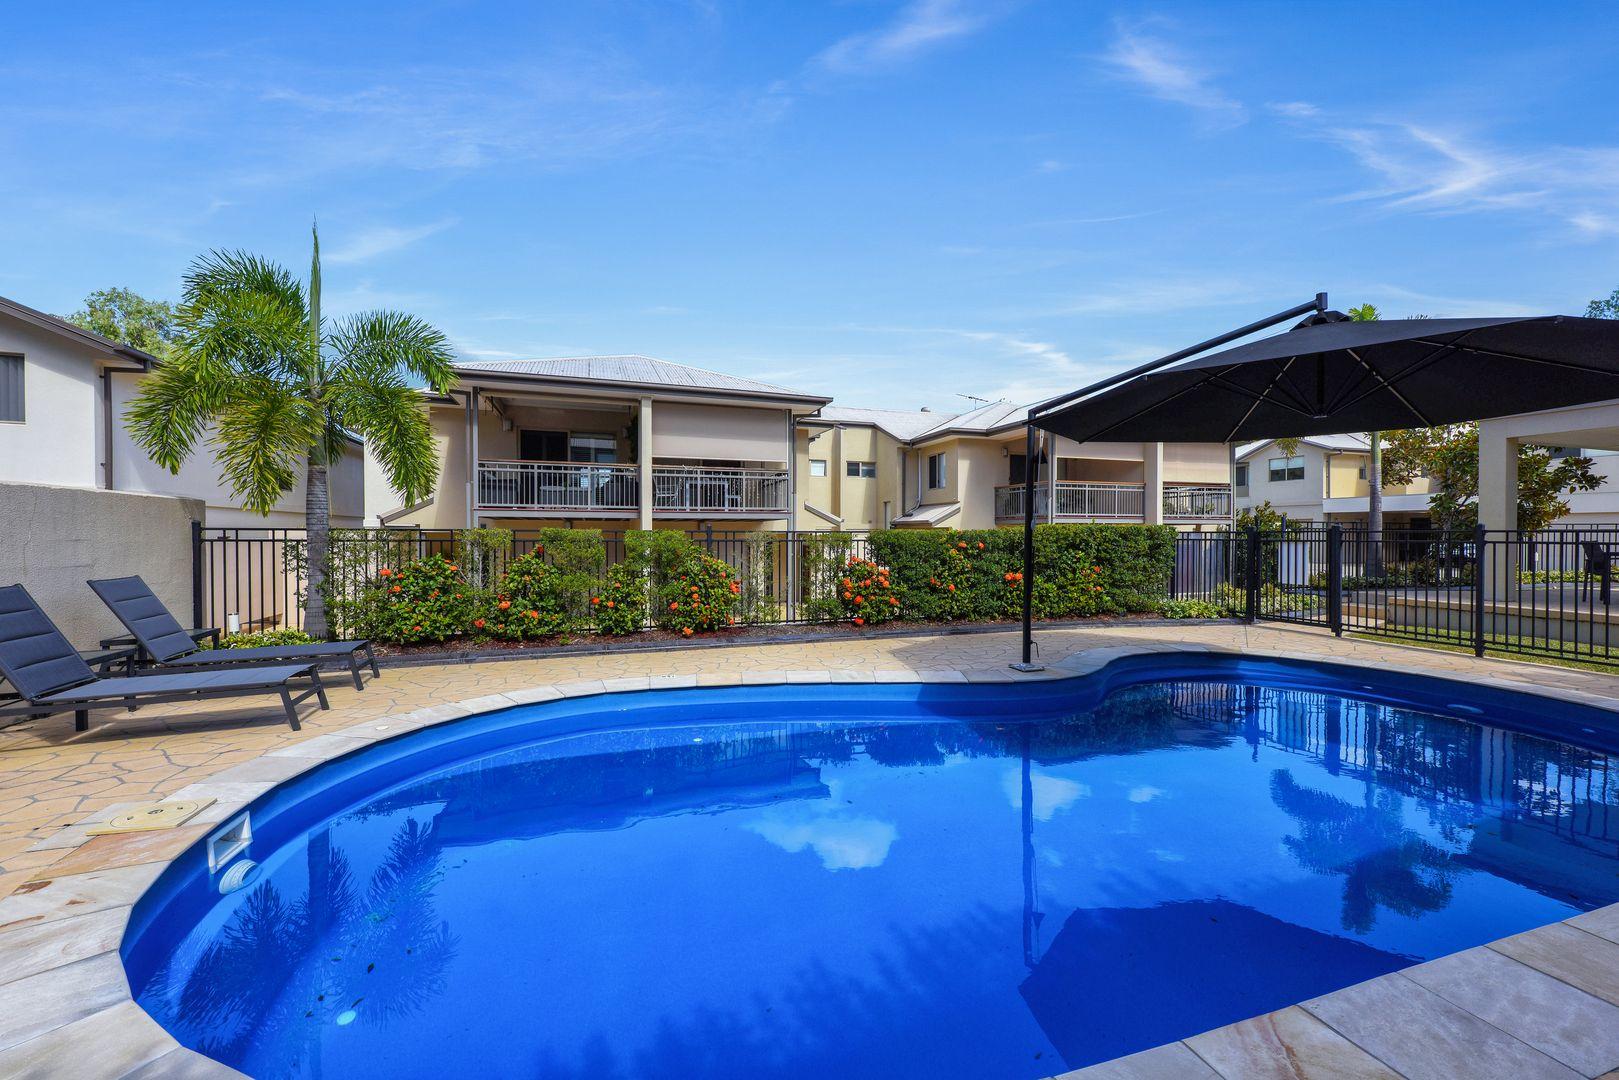 12/158 Woogaroo Street, Forest Lake QLD 4078, Image 0